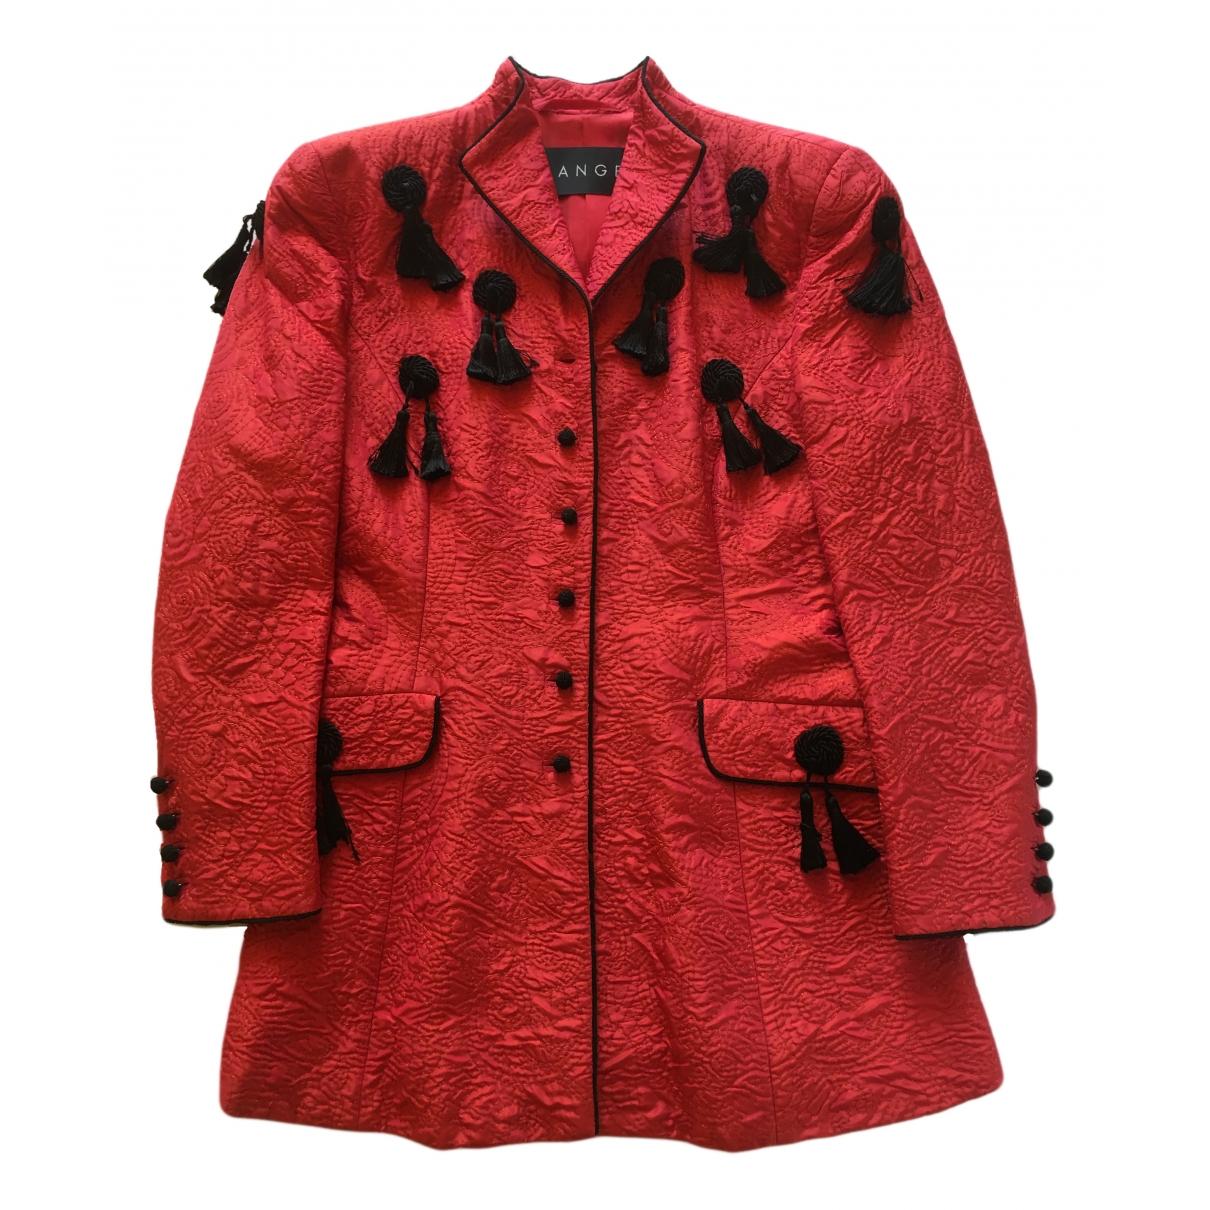 Rena Lange - Veste   pour femme en soie - rouge